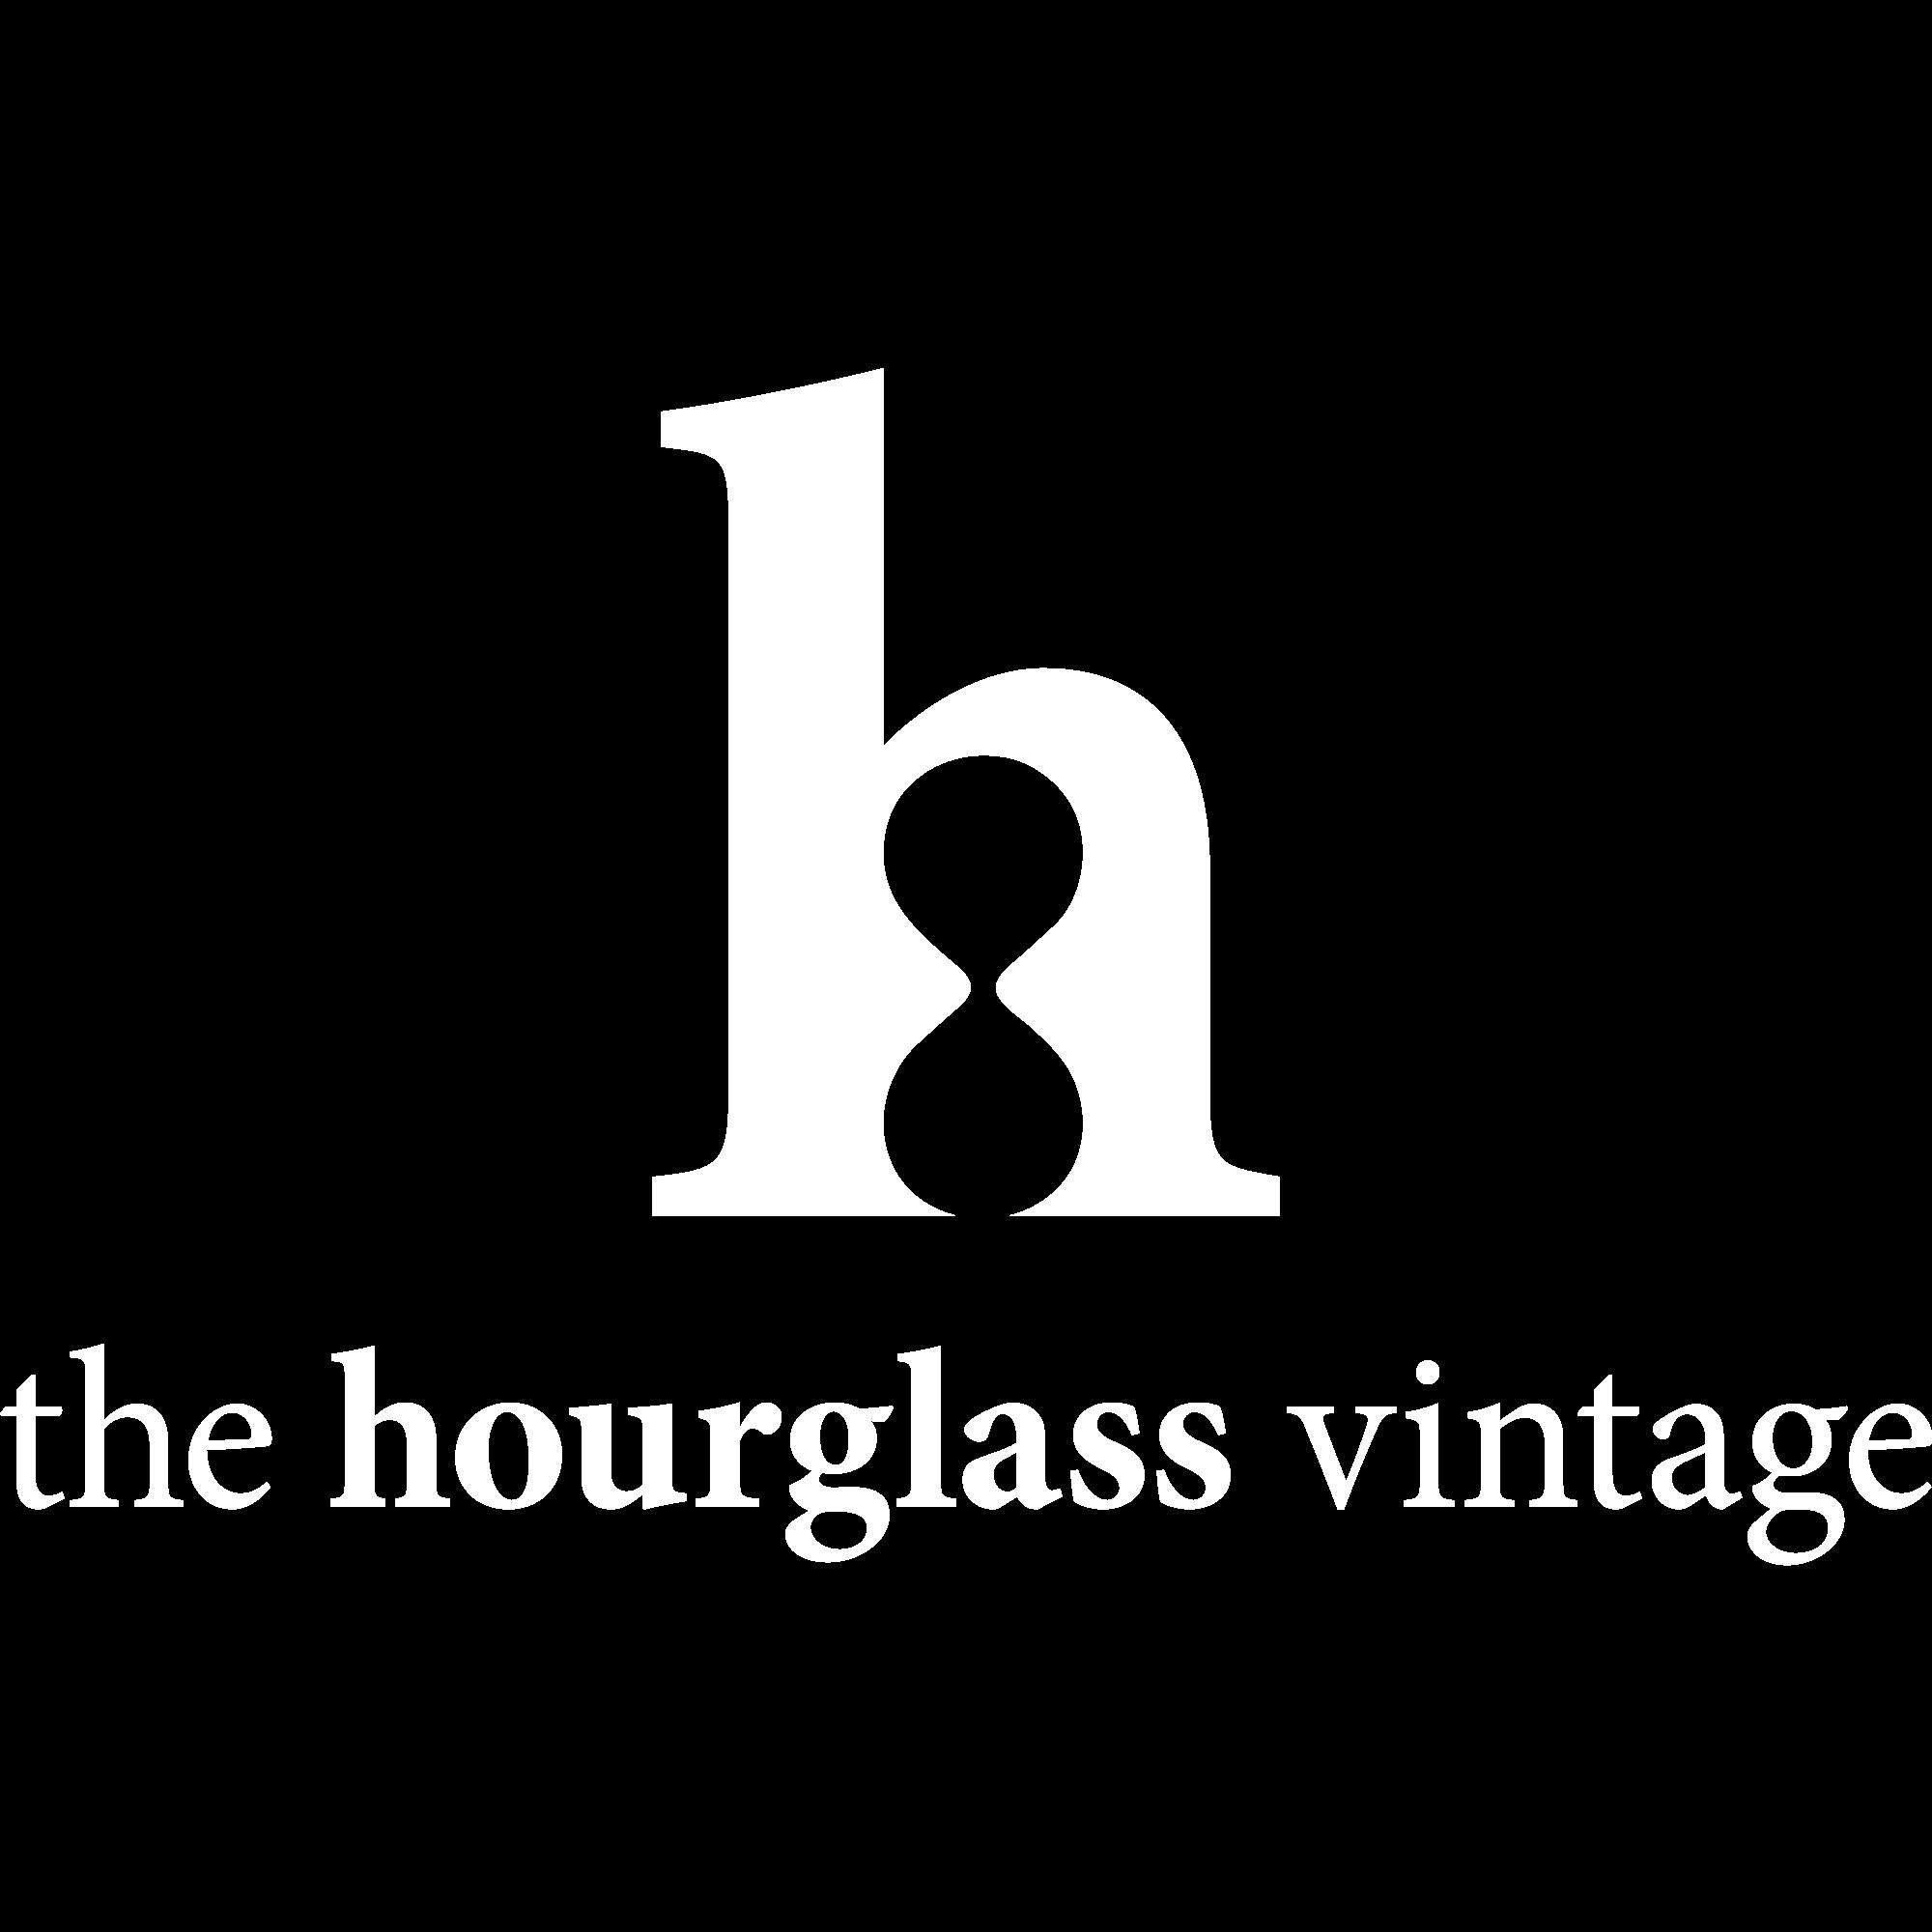 The Hourglass Vintage White Logo